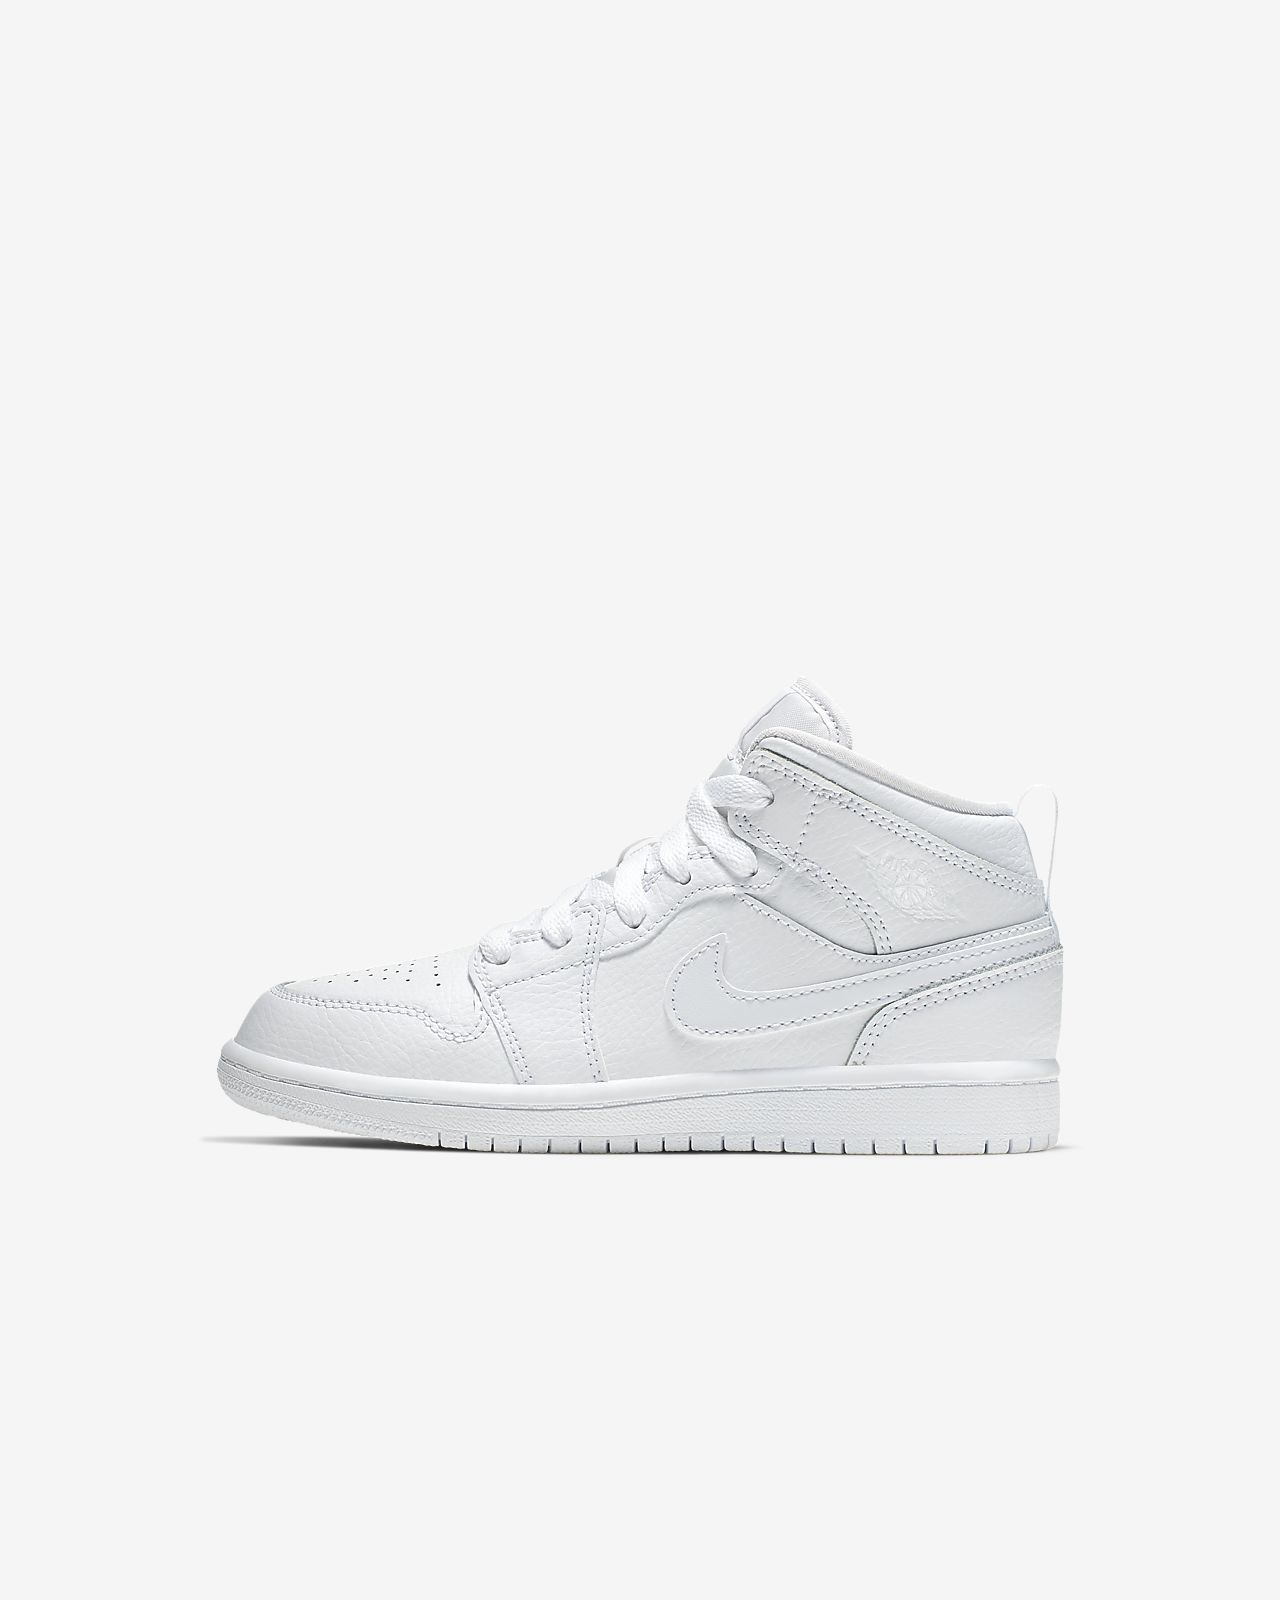 Air Jordan 1 Mid cipő gyerekeknek